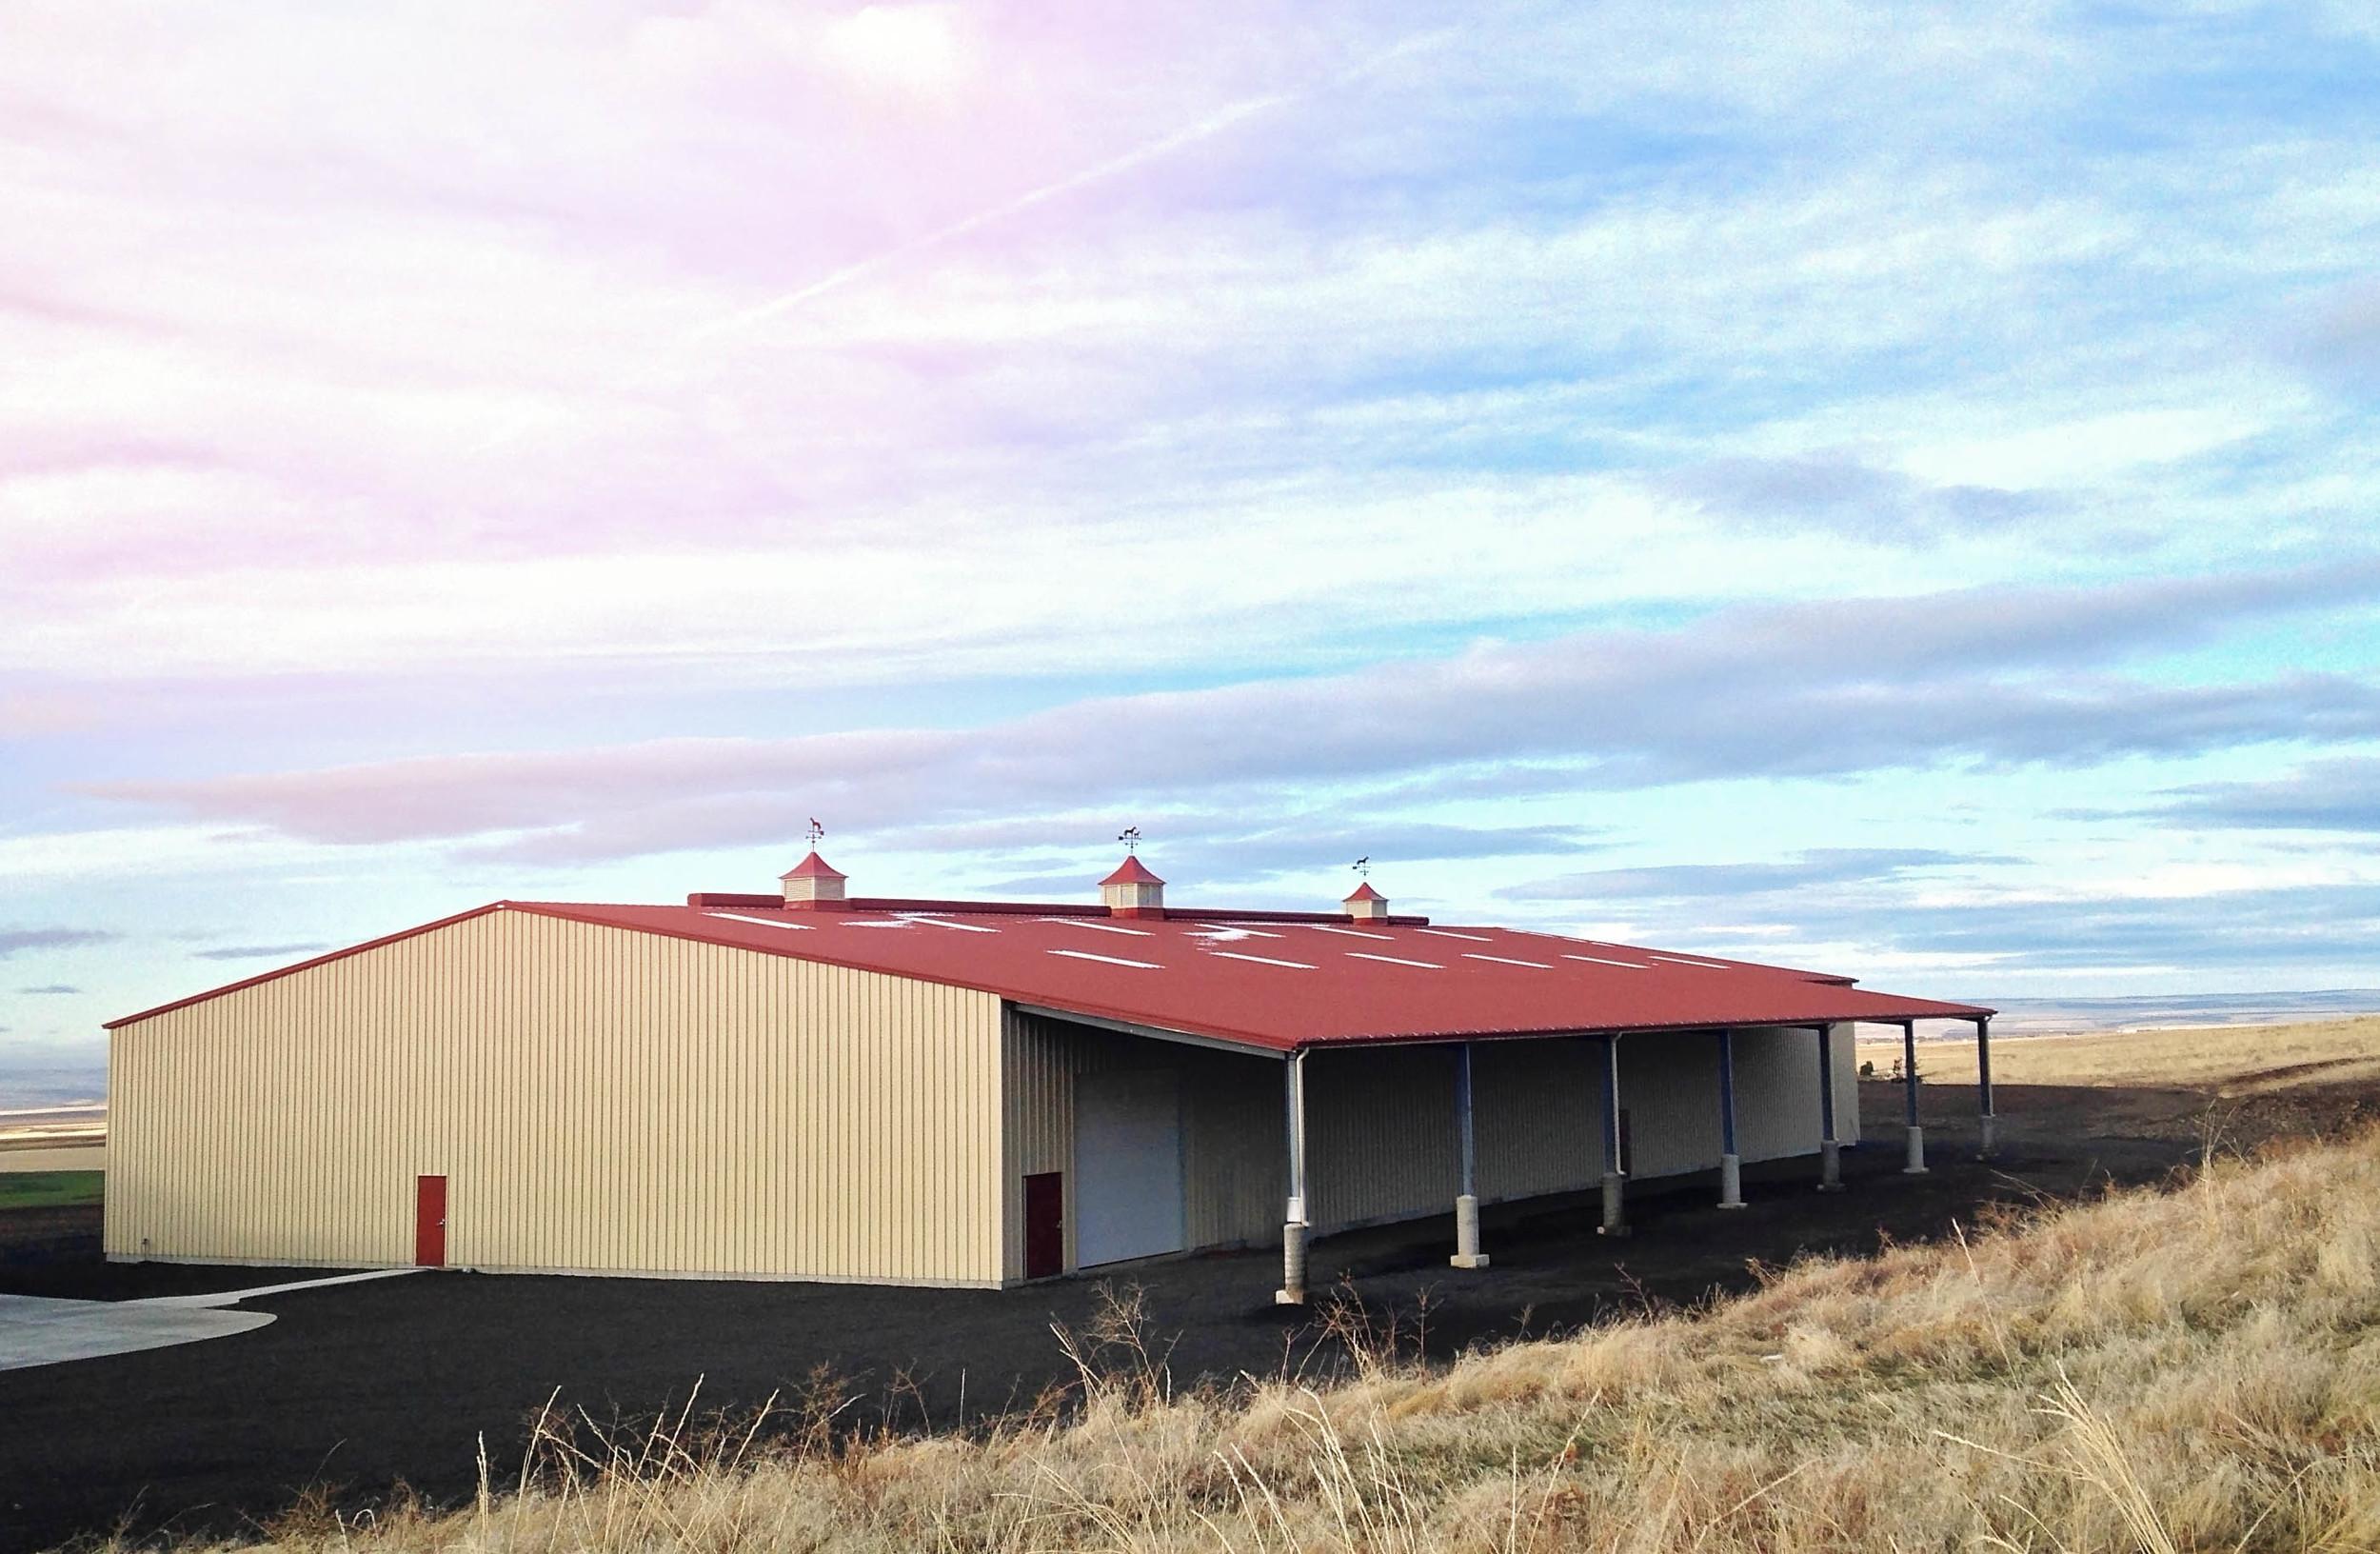 The 7UP Riding Arena located near Pendleton, Oregon.